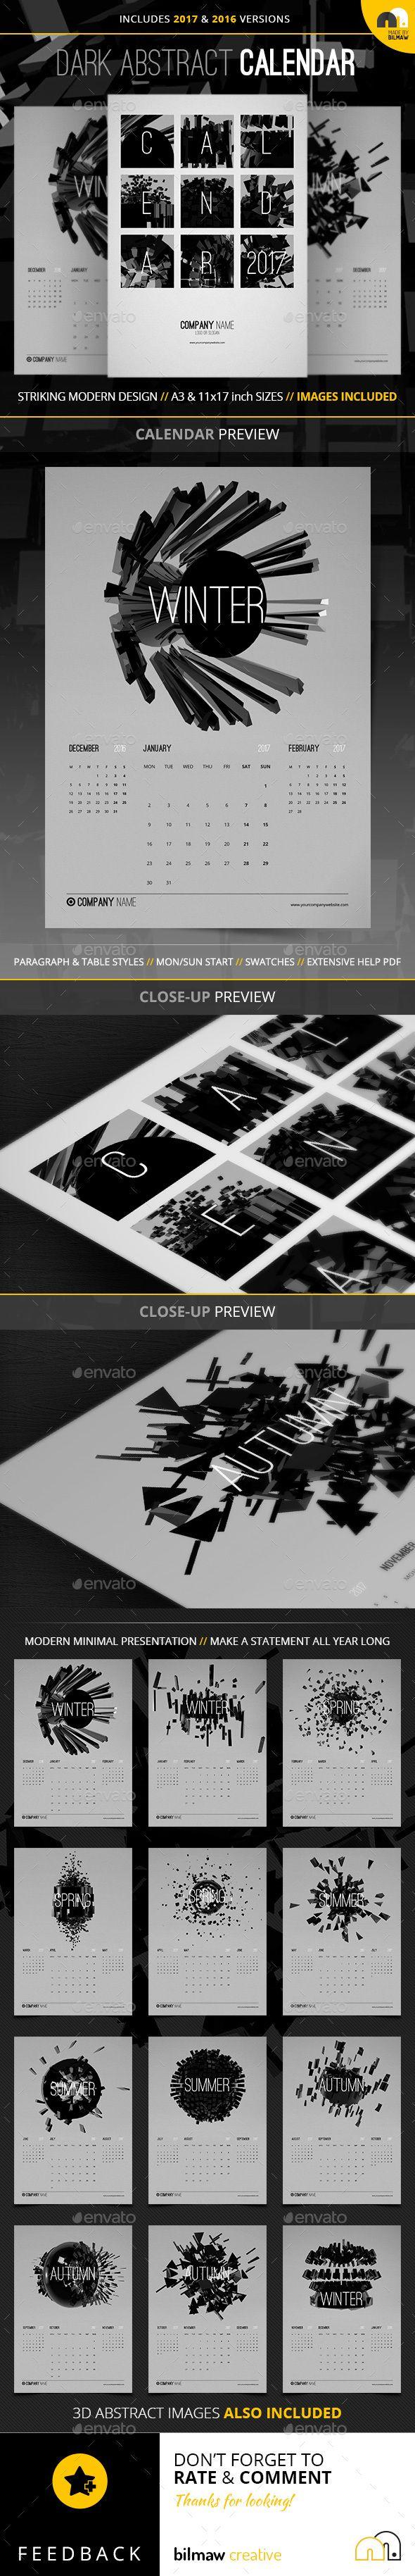 Dark+Abstract+Calendar / Wall calendars / Template / Print / All artwork included.